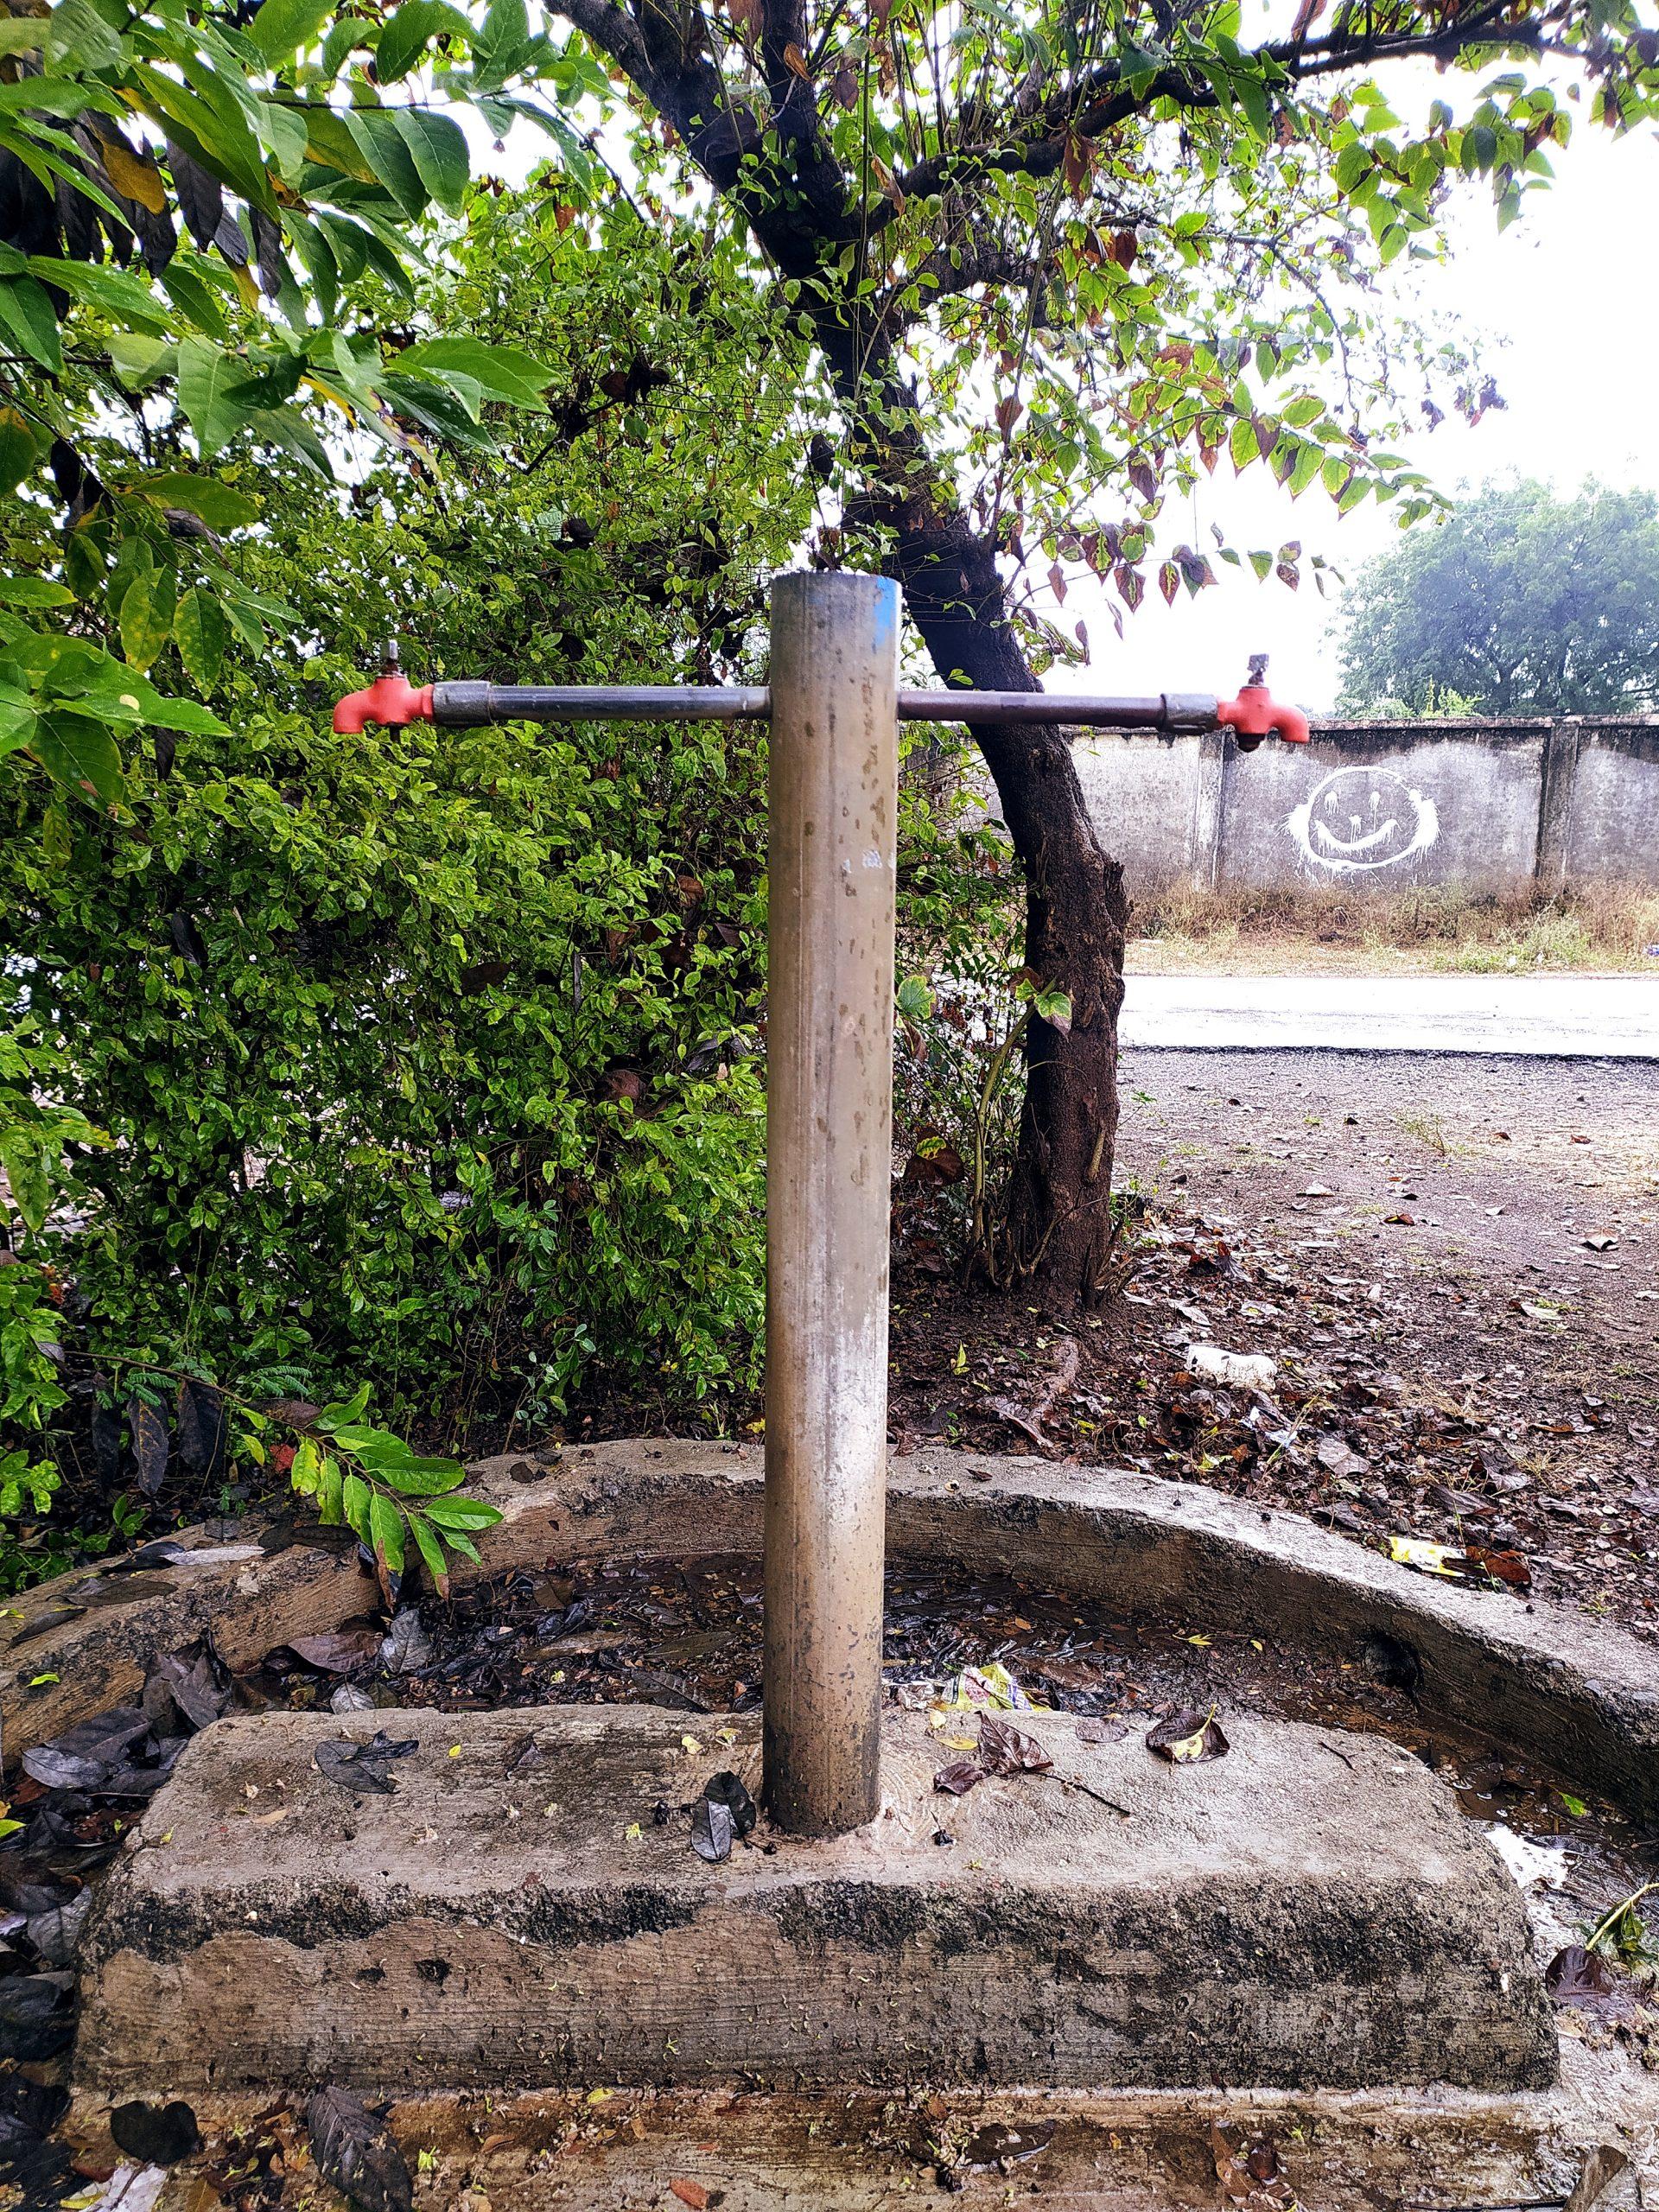 A tap